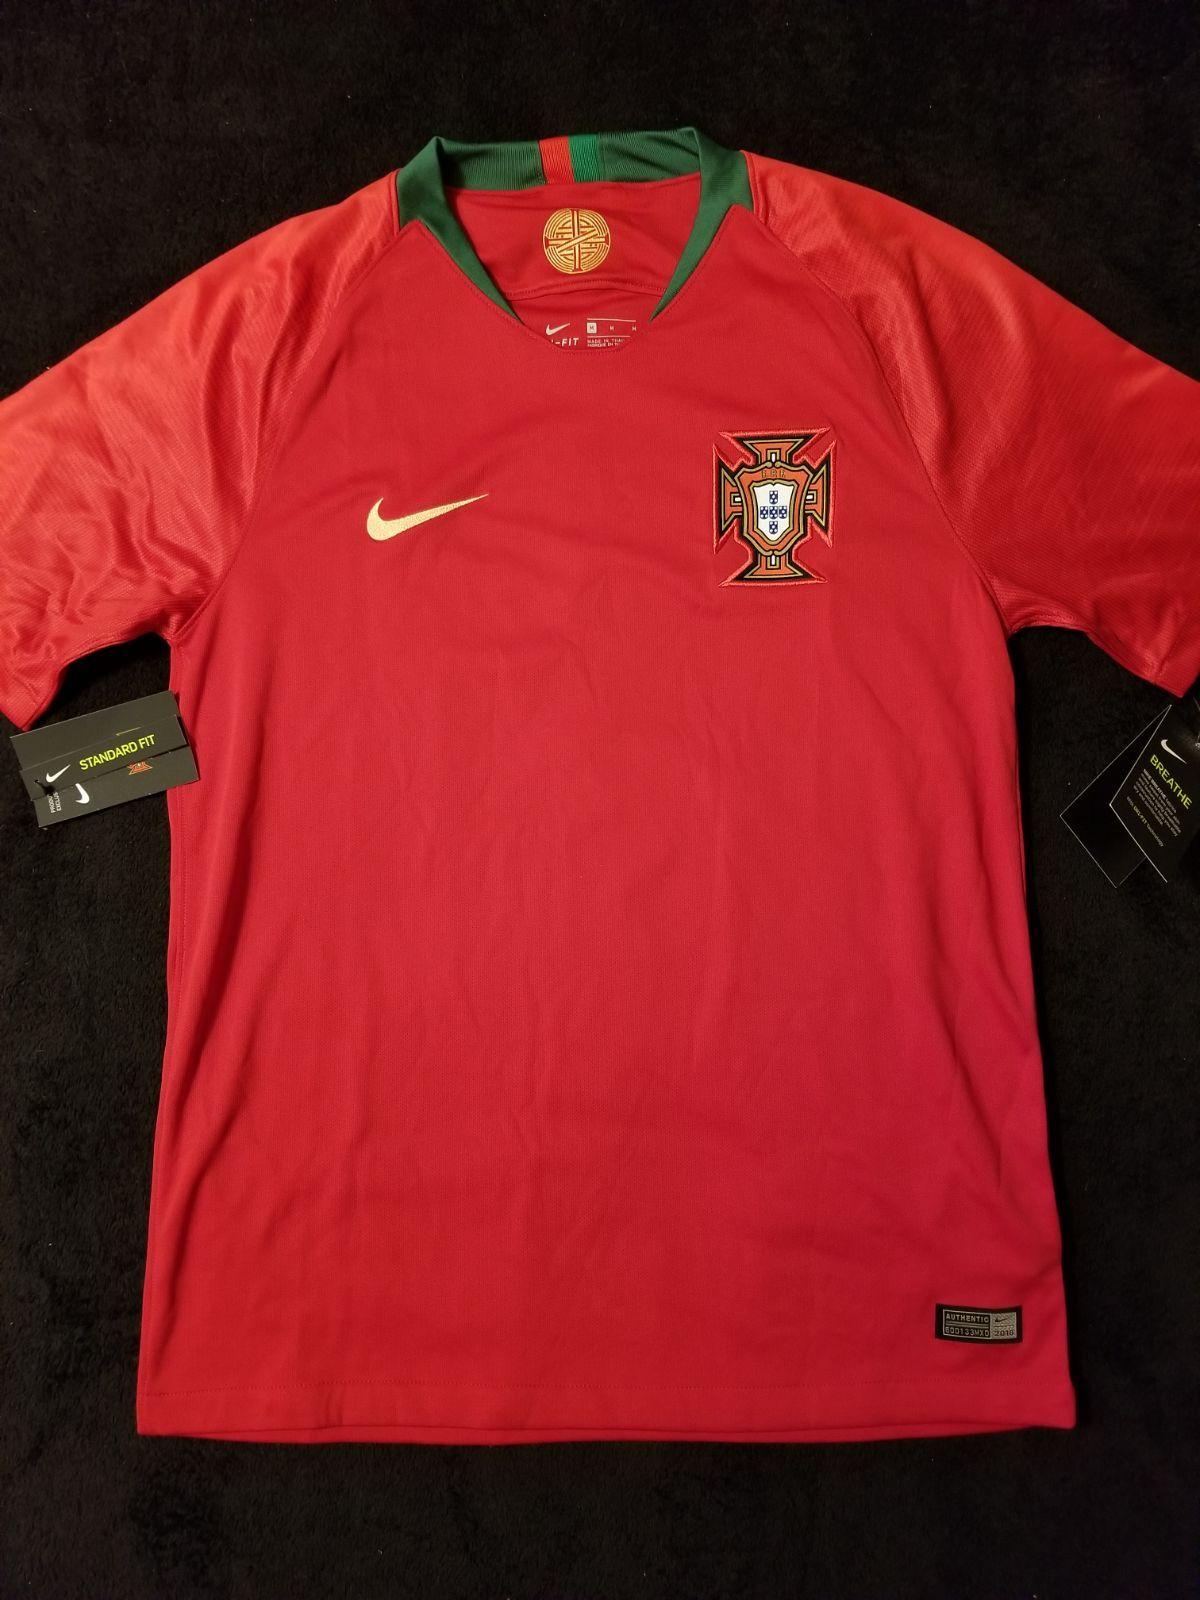 Nike 2018 Ronaldo World Cup Jersey Sz M In 2020 Ronaldo Jersey World Cup Jerseys Ronaldo Portugal Jersey